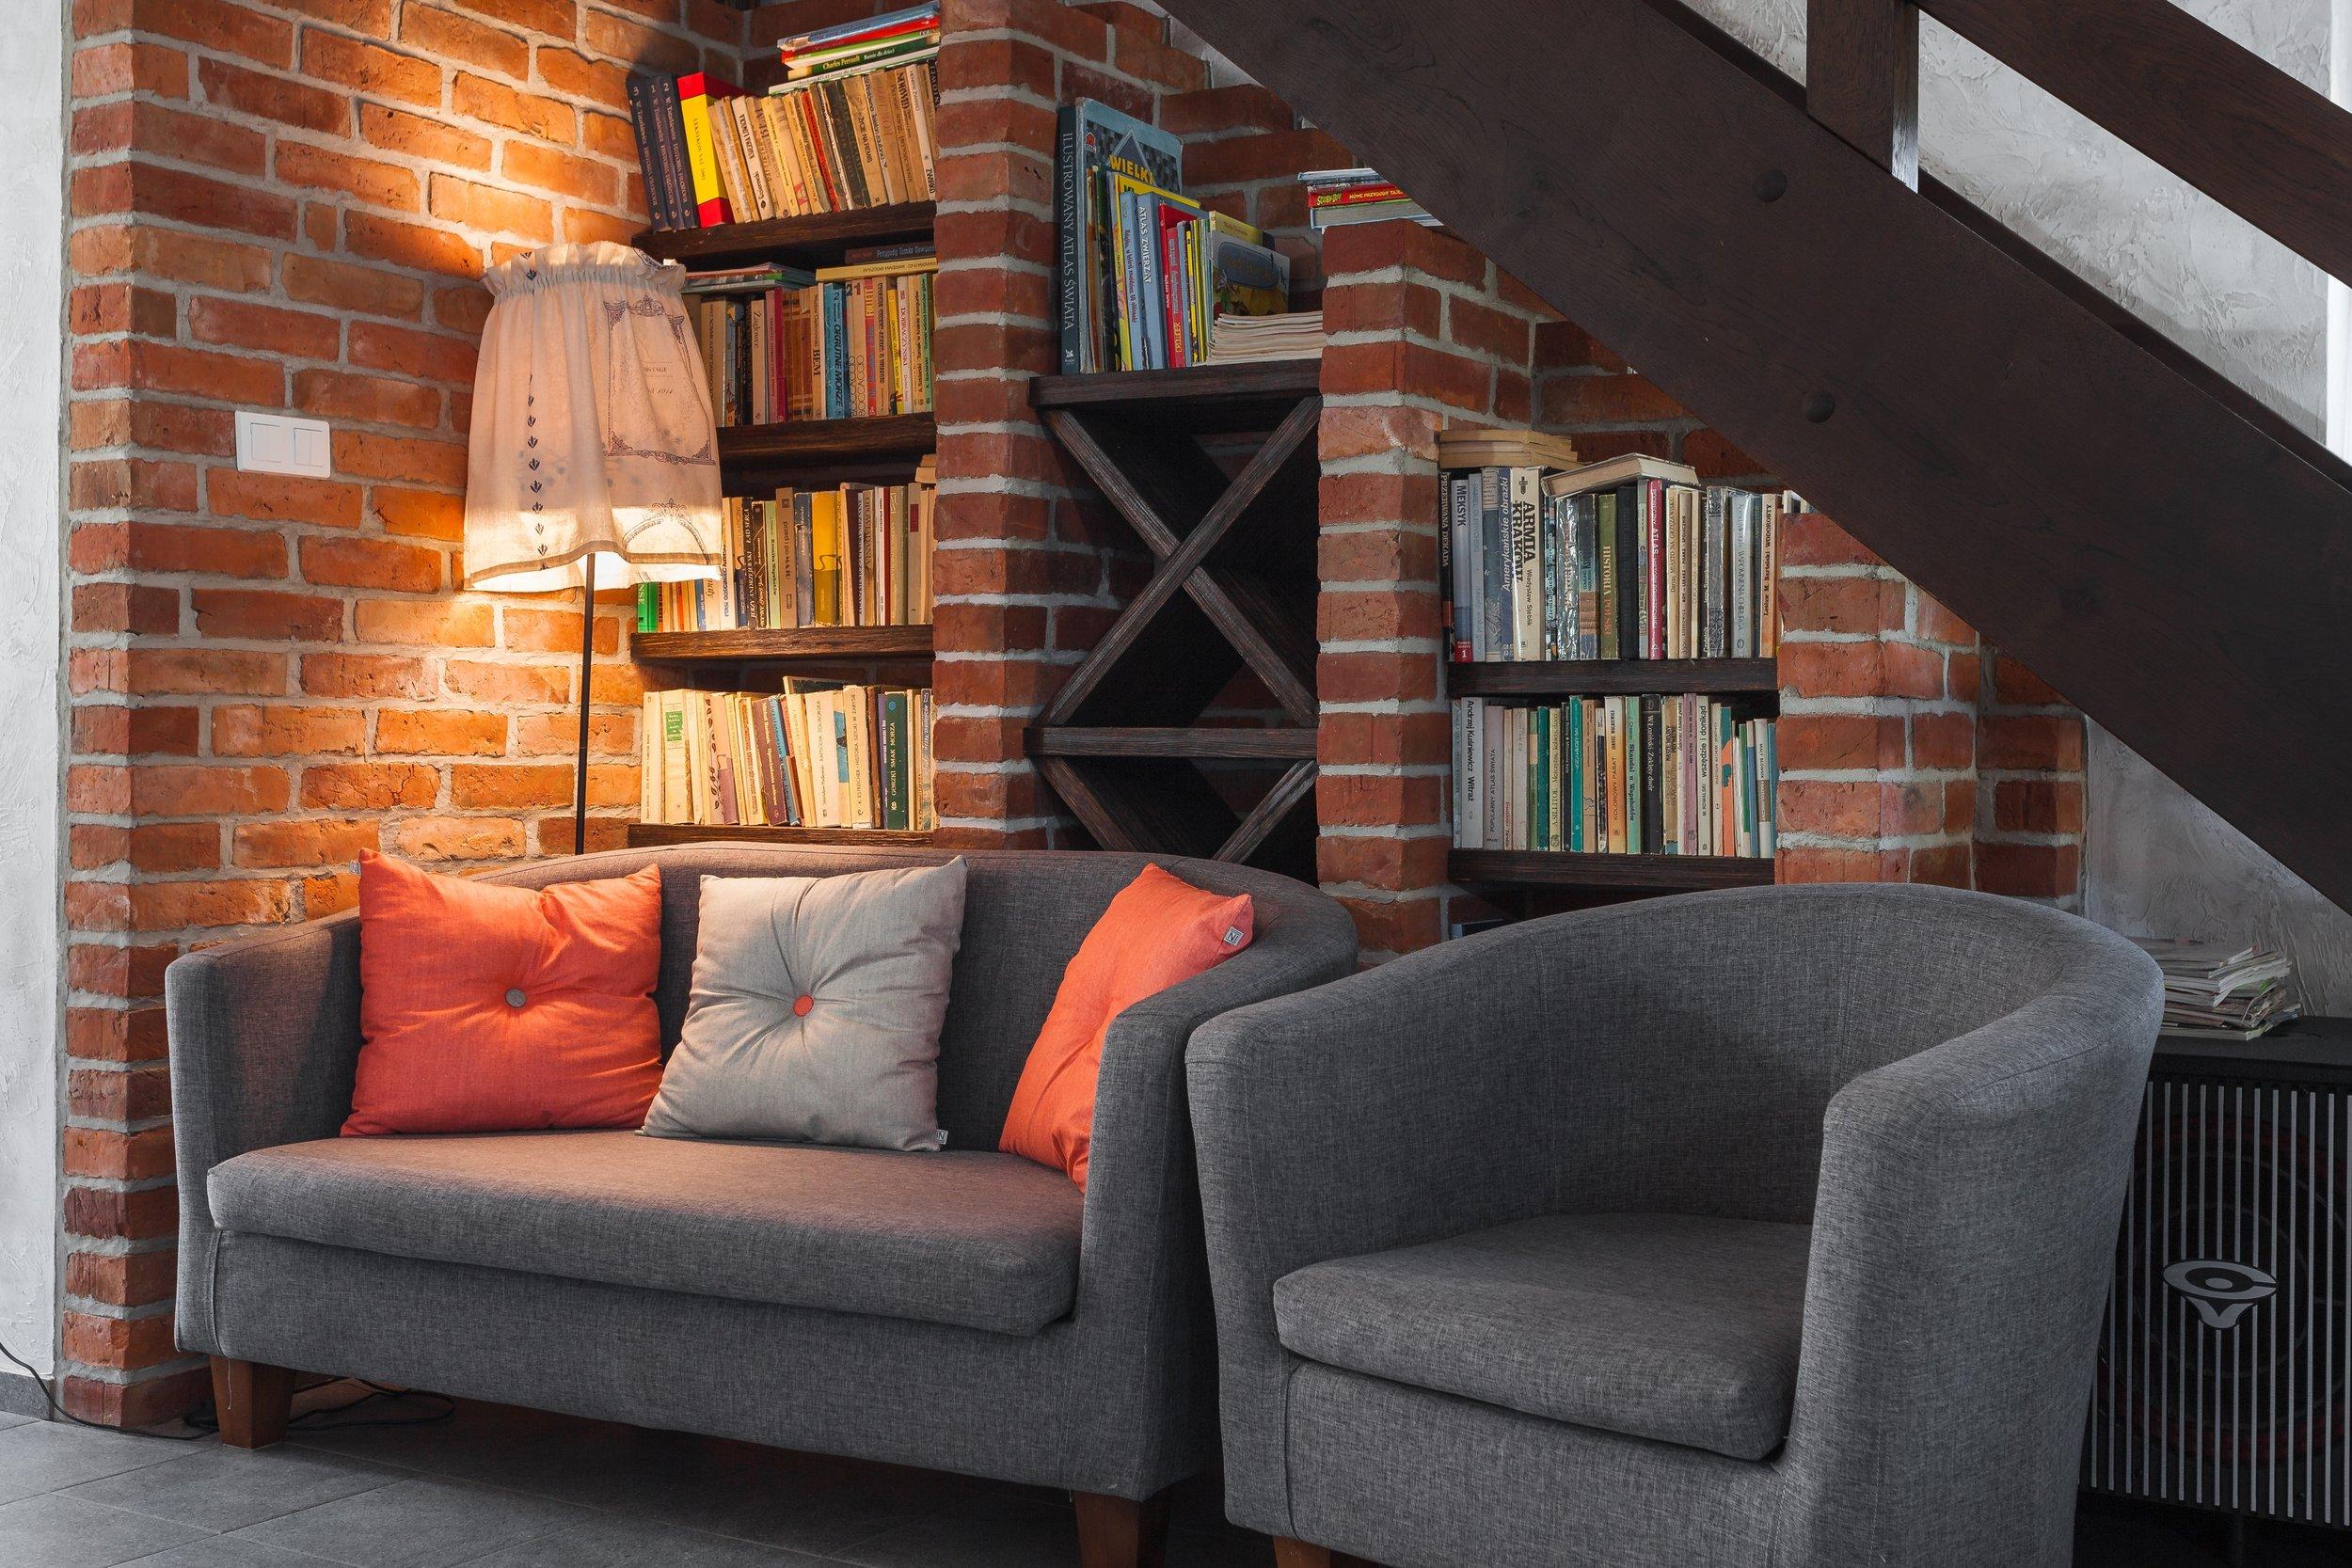 apartment-architecture-bookcase-257344.jpg